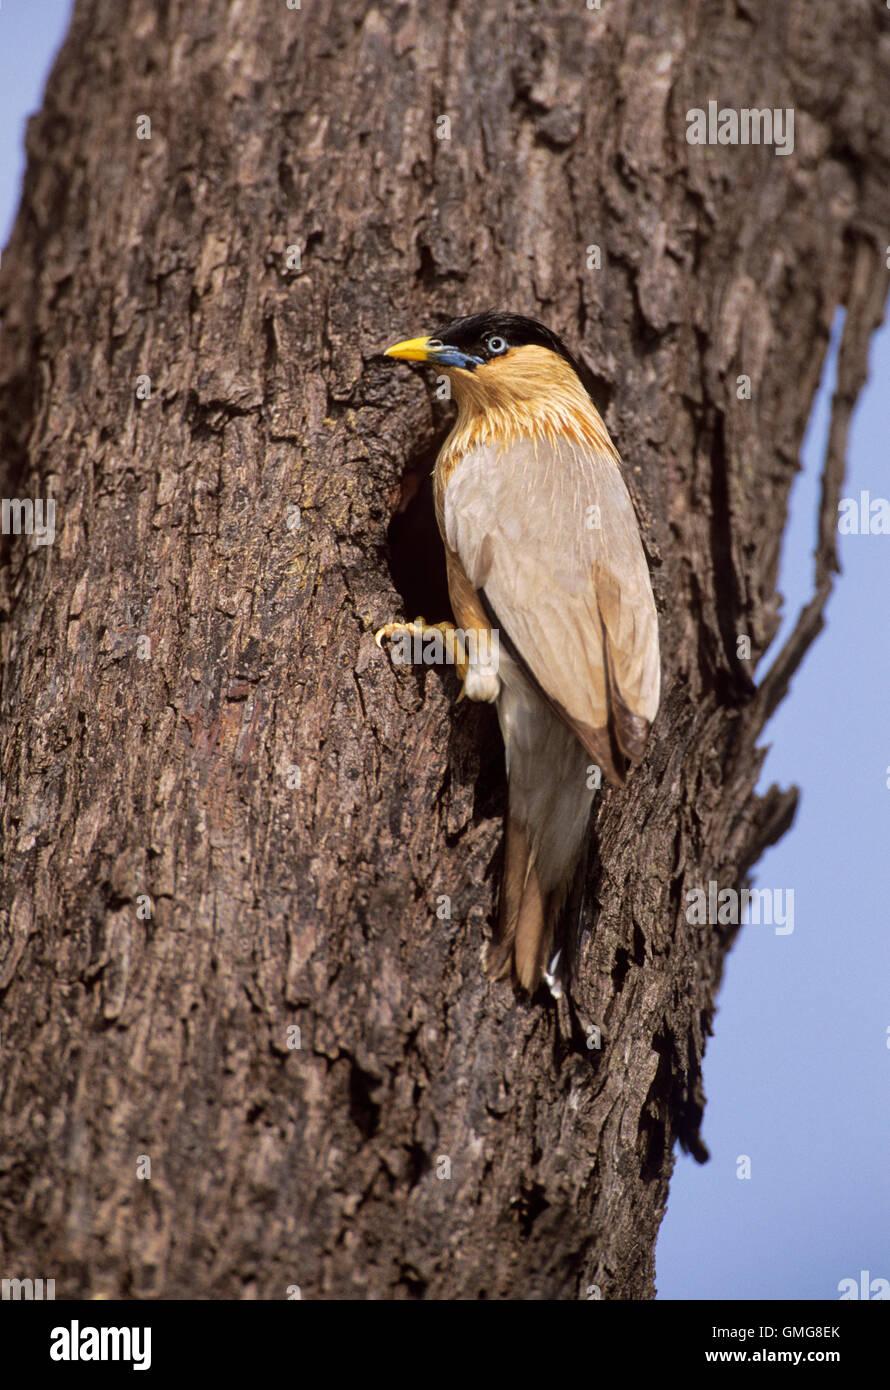 Brahminy Myna or Brahminy Starling, Sturnus pagodarum, at nest hole on tree, Keoladeo Ghana National Park,India - Stock Image